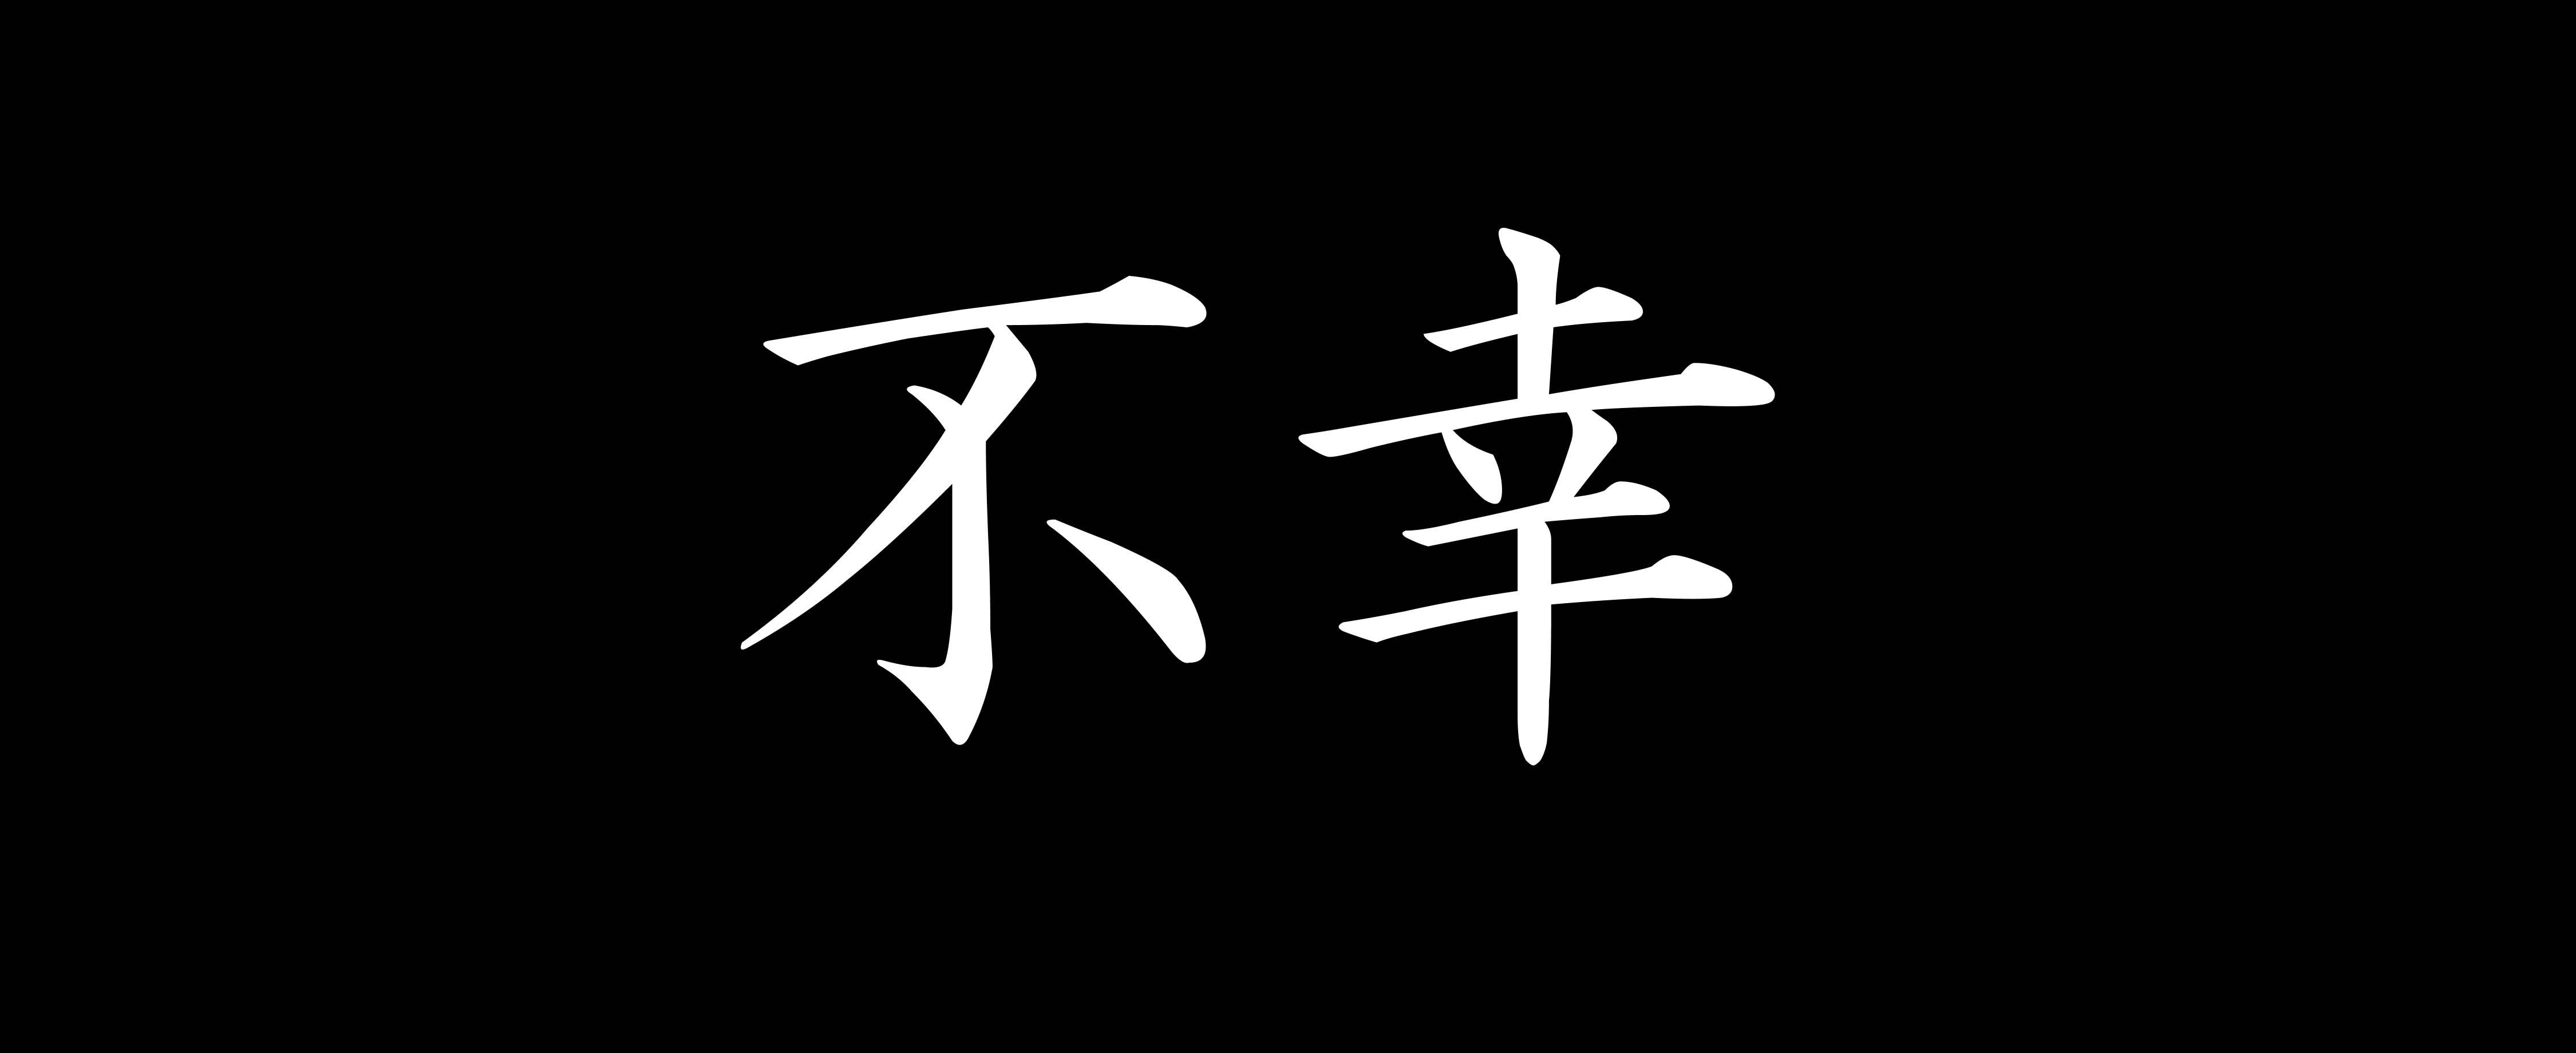 Fucho (不幸)